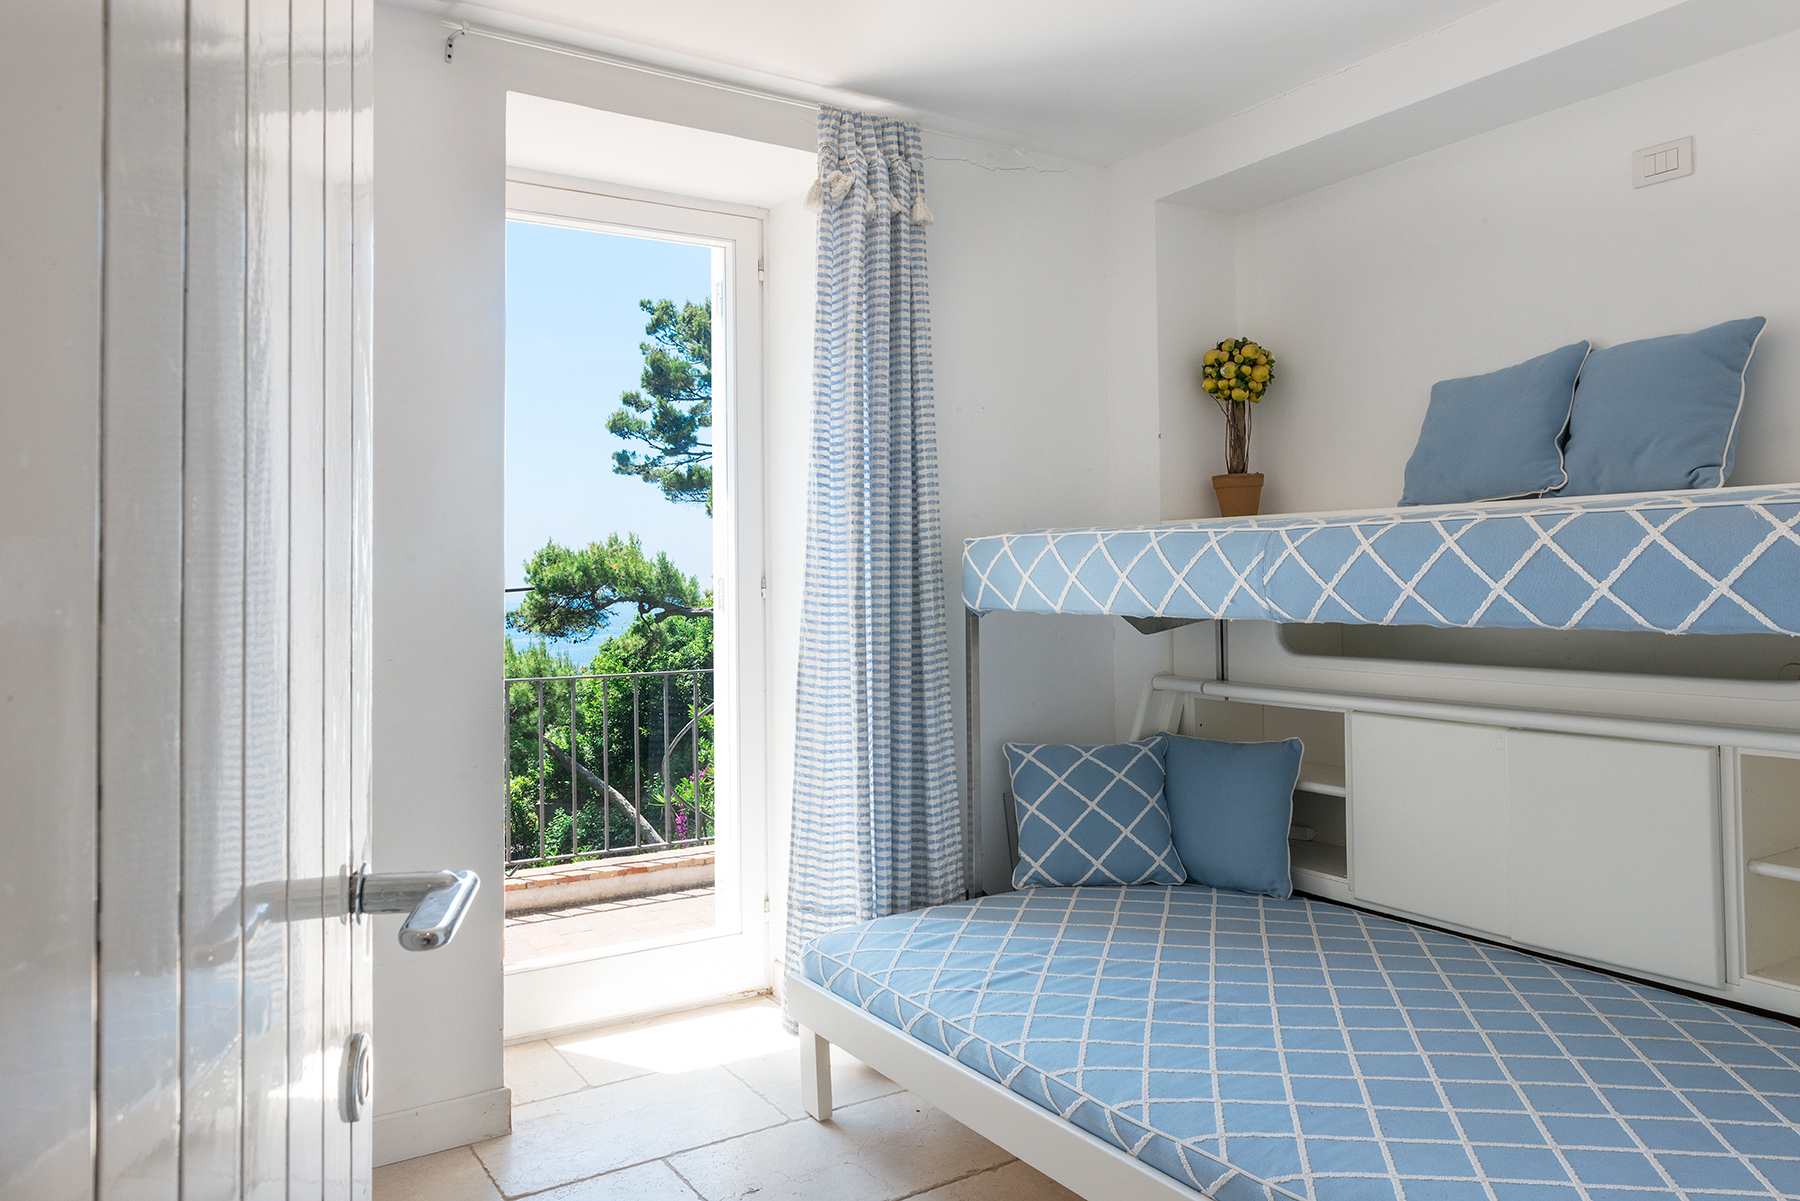 Additional photo for property listing at Villa Pieds dans l'eau in Capri Capri, Naples Italy